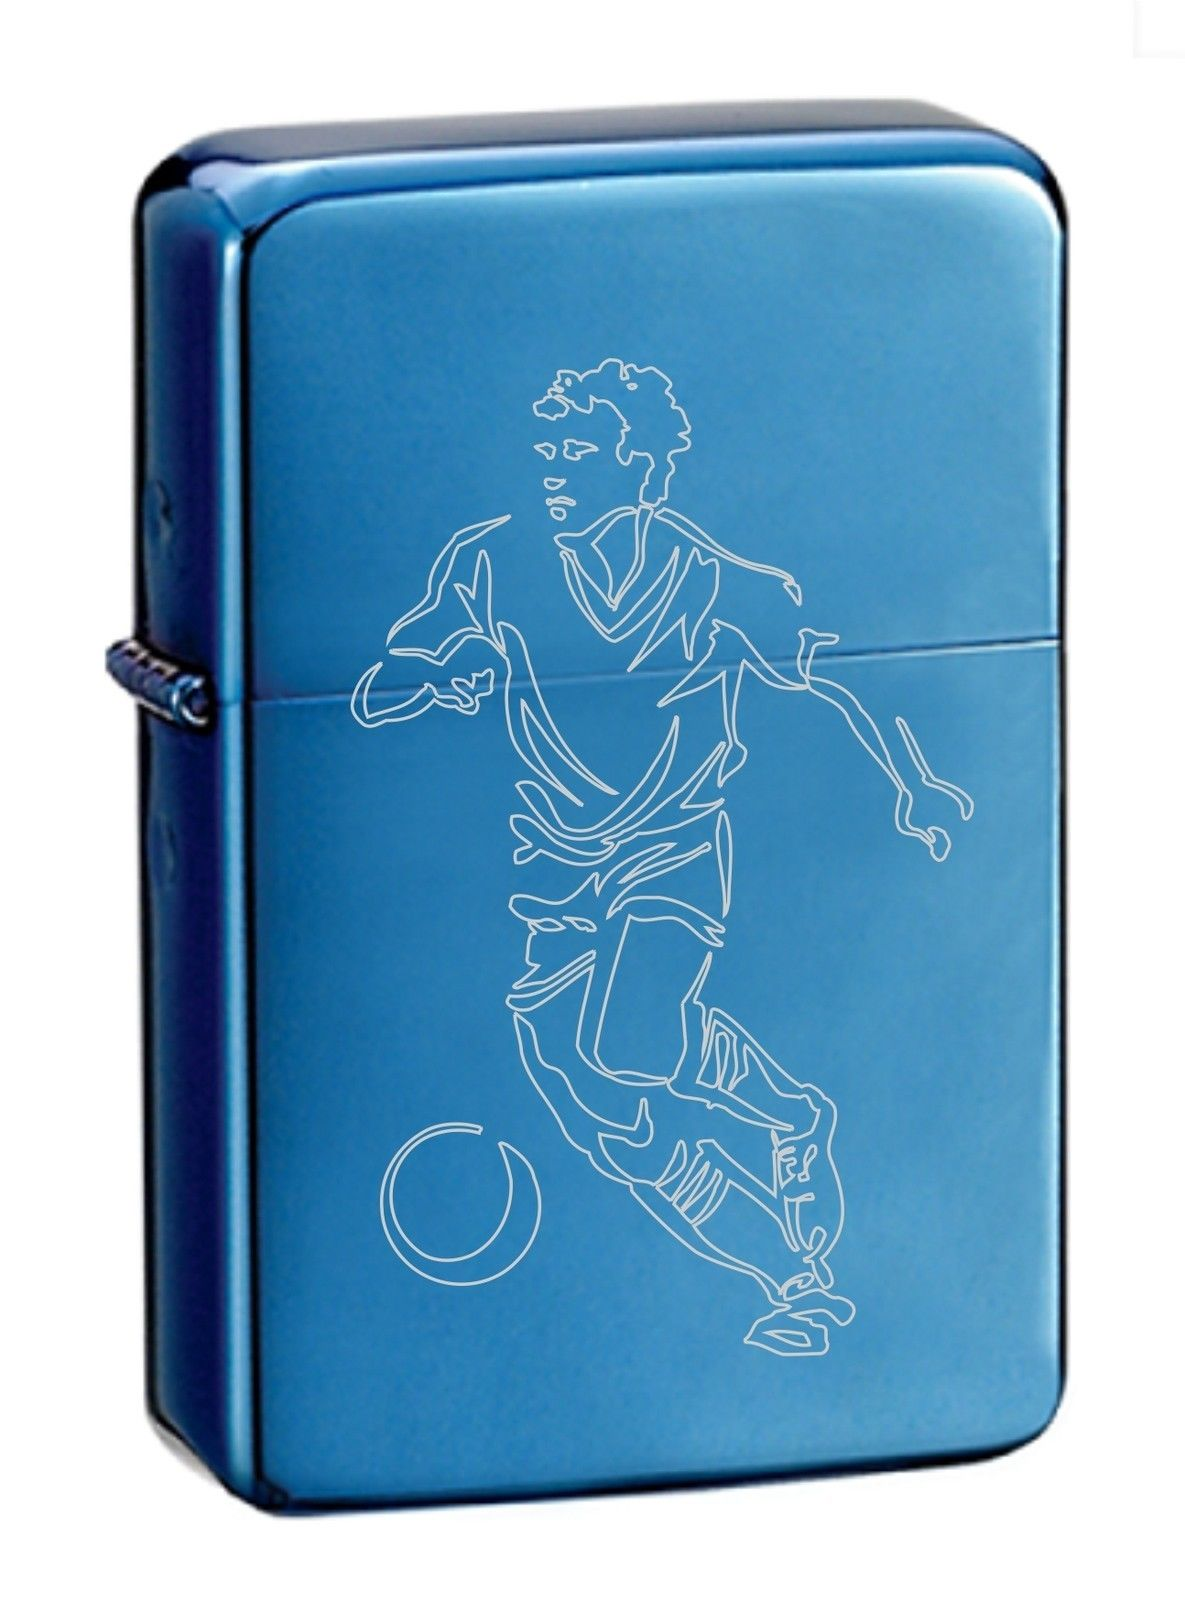 footballer-blue-ice